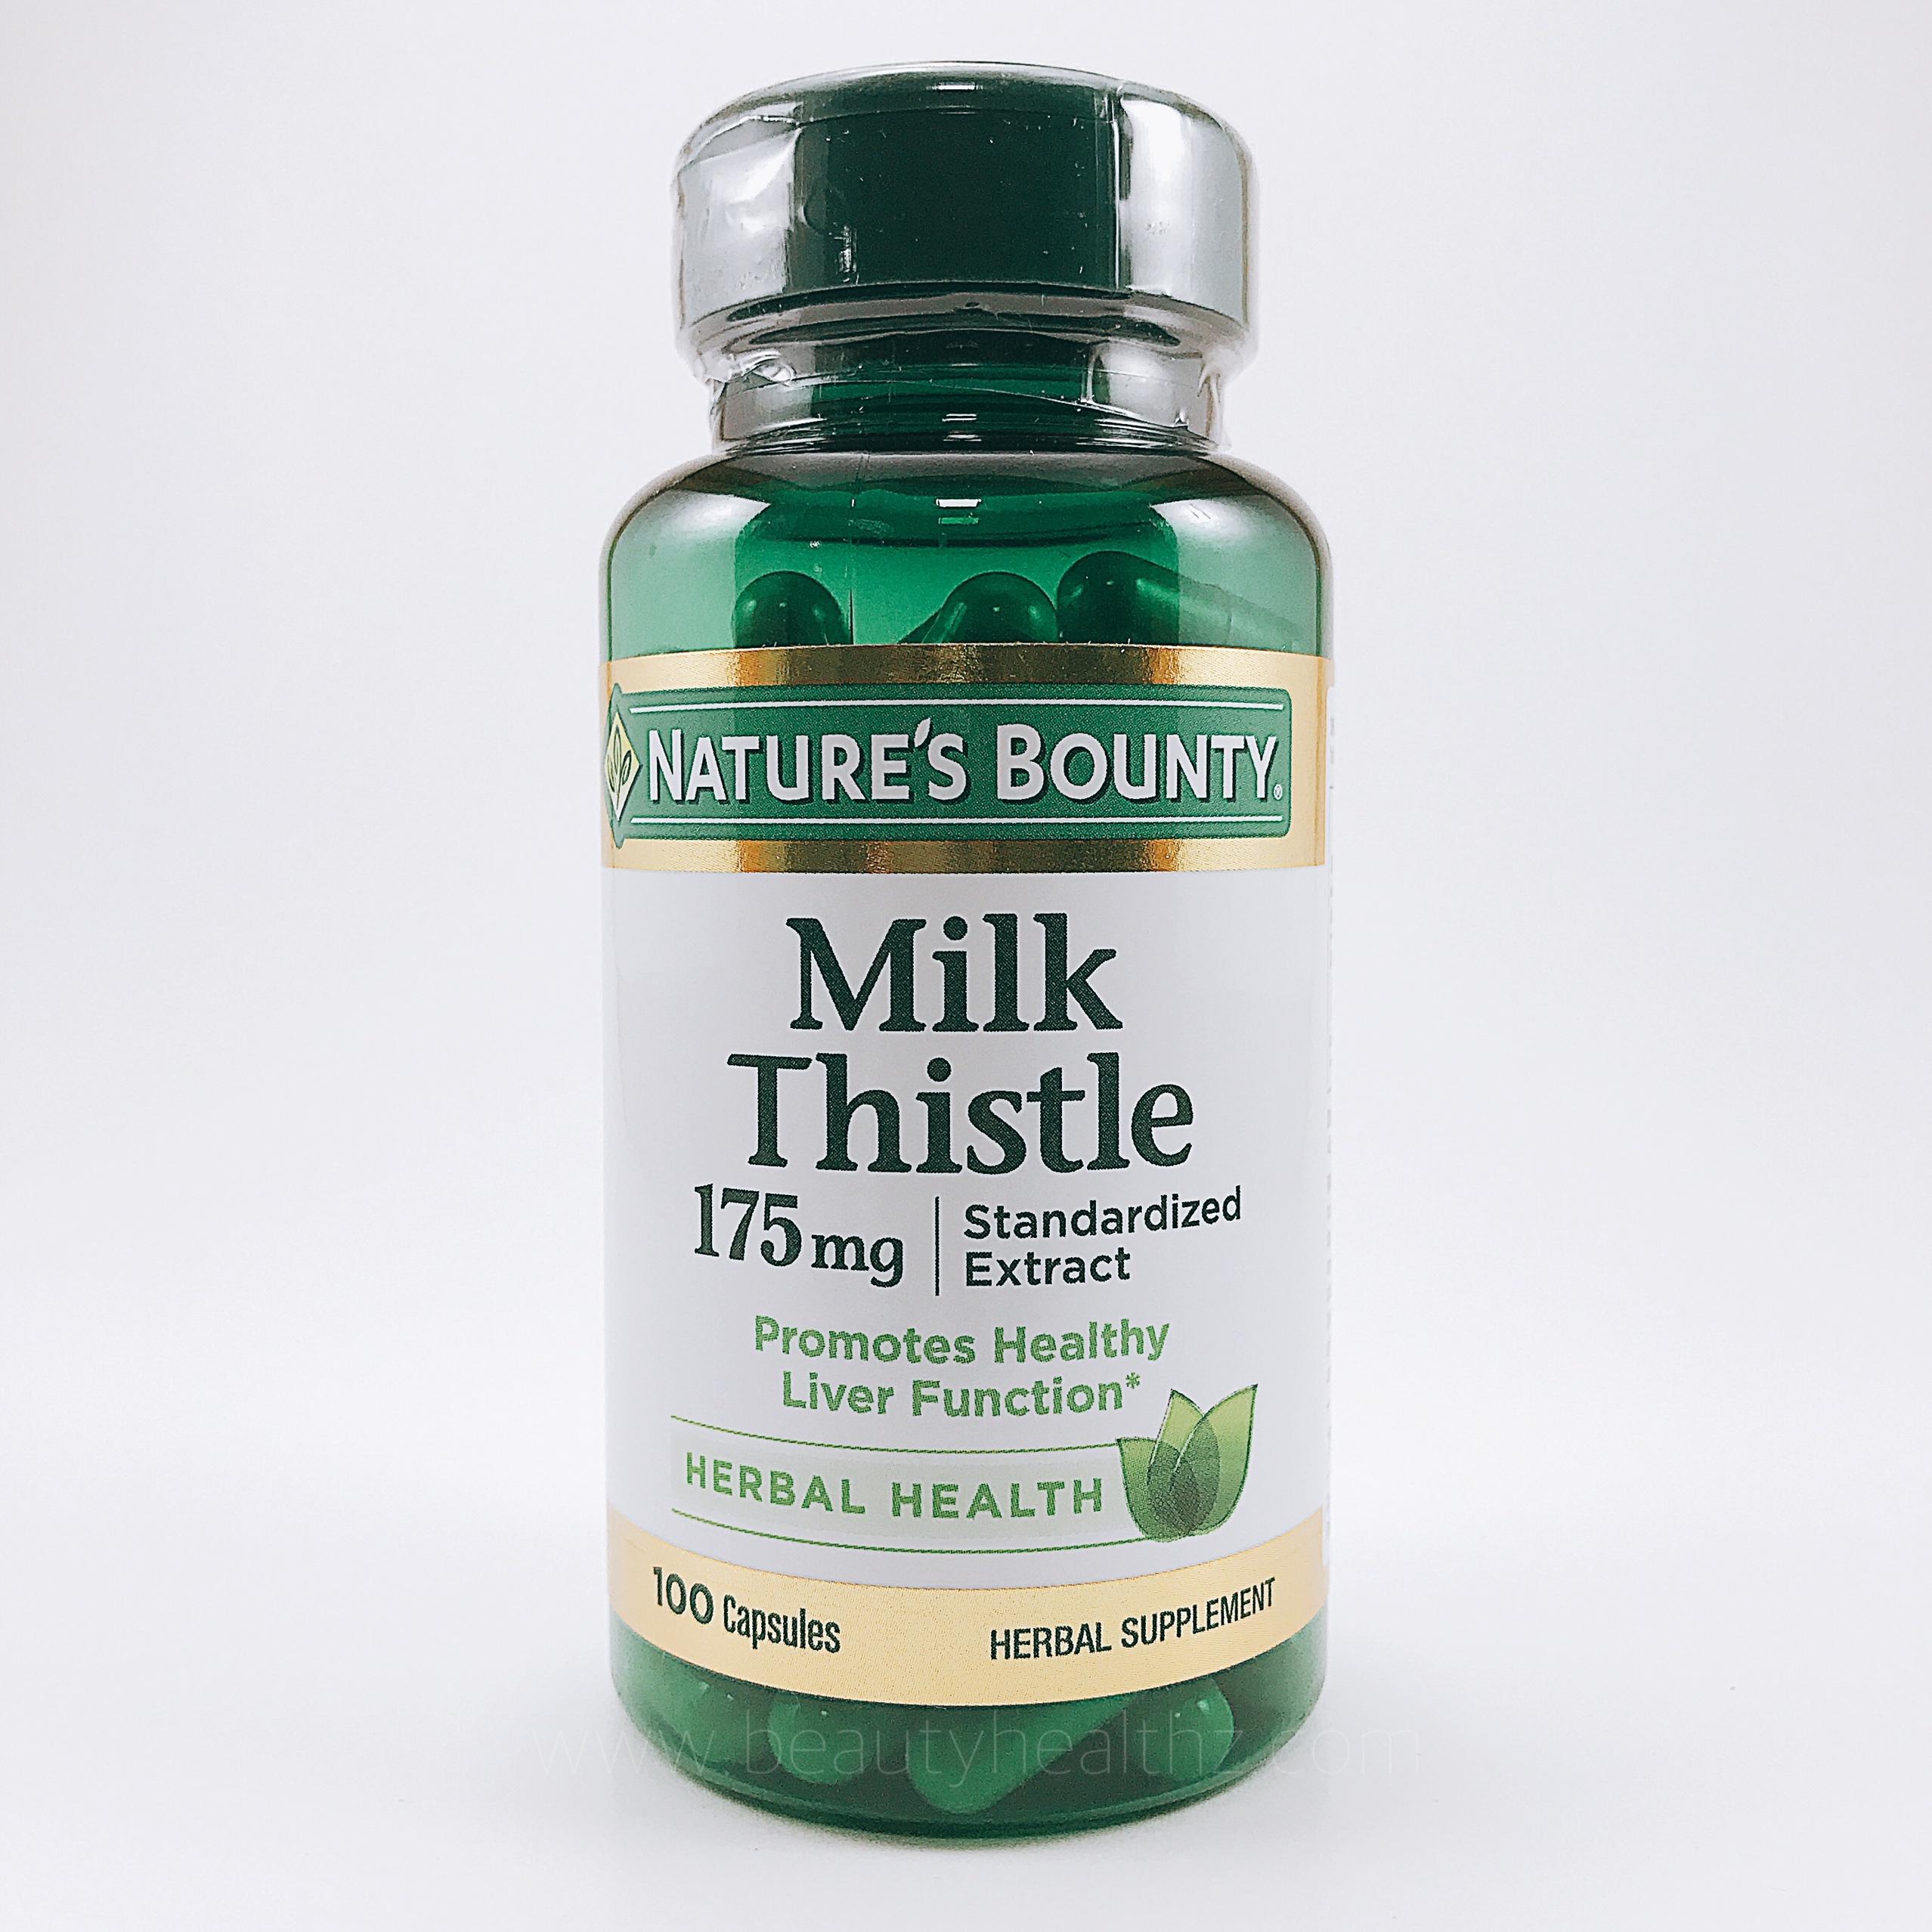 Nature's Bounty, Milk Thistle, 175 mg, 100 Capsules